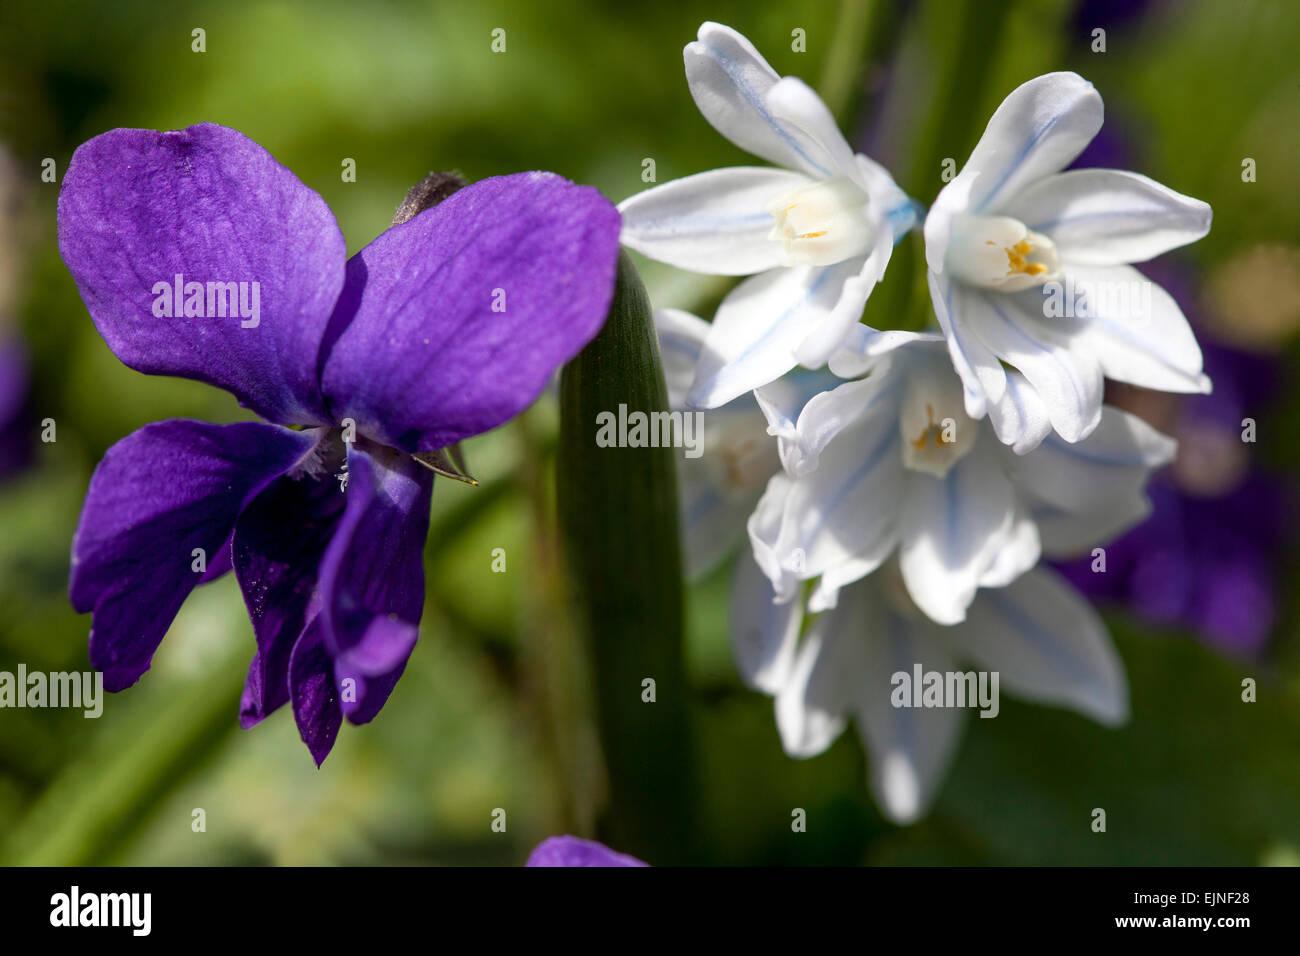 Sweet violet flowers Viola odorata - Stock Image